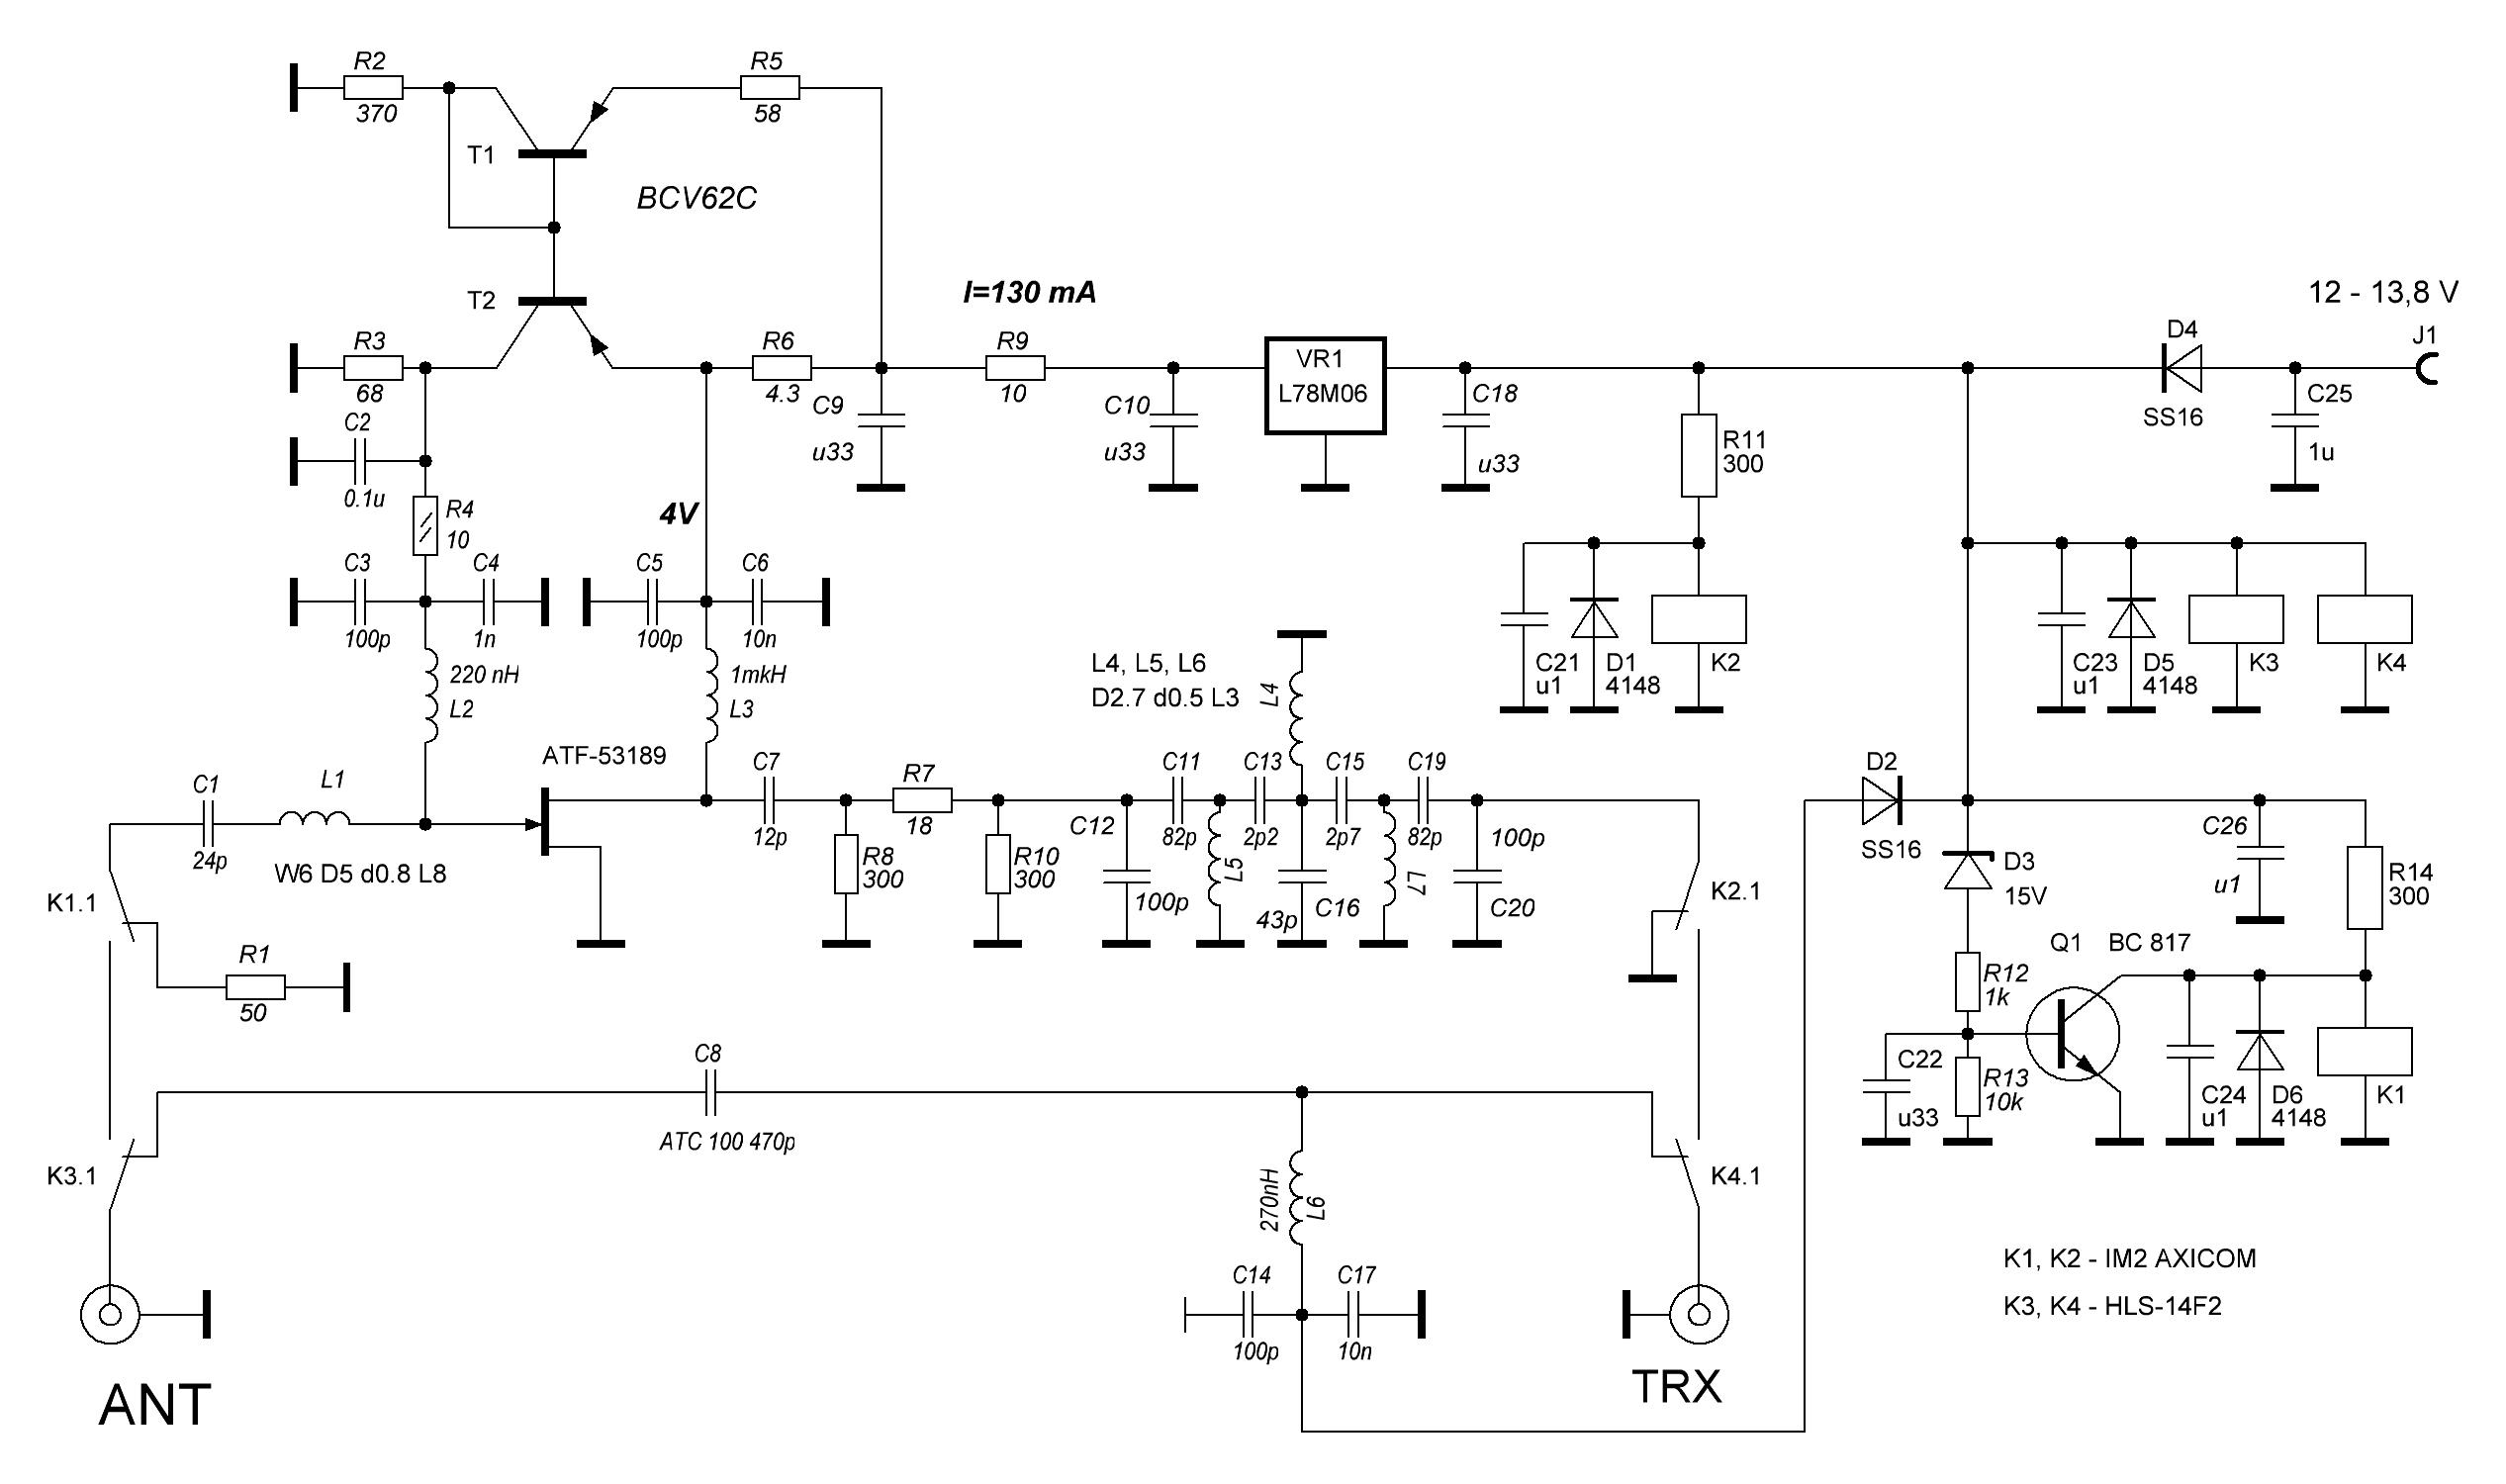 LNA 2m QRO schematics revision from 2021-06-05